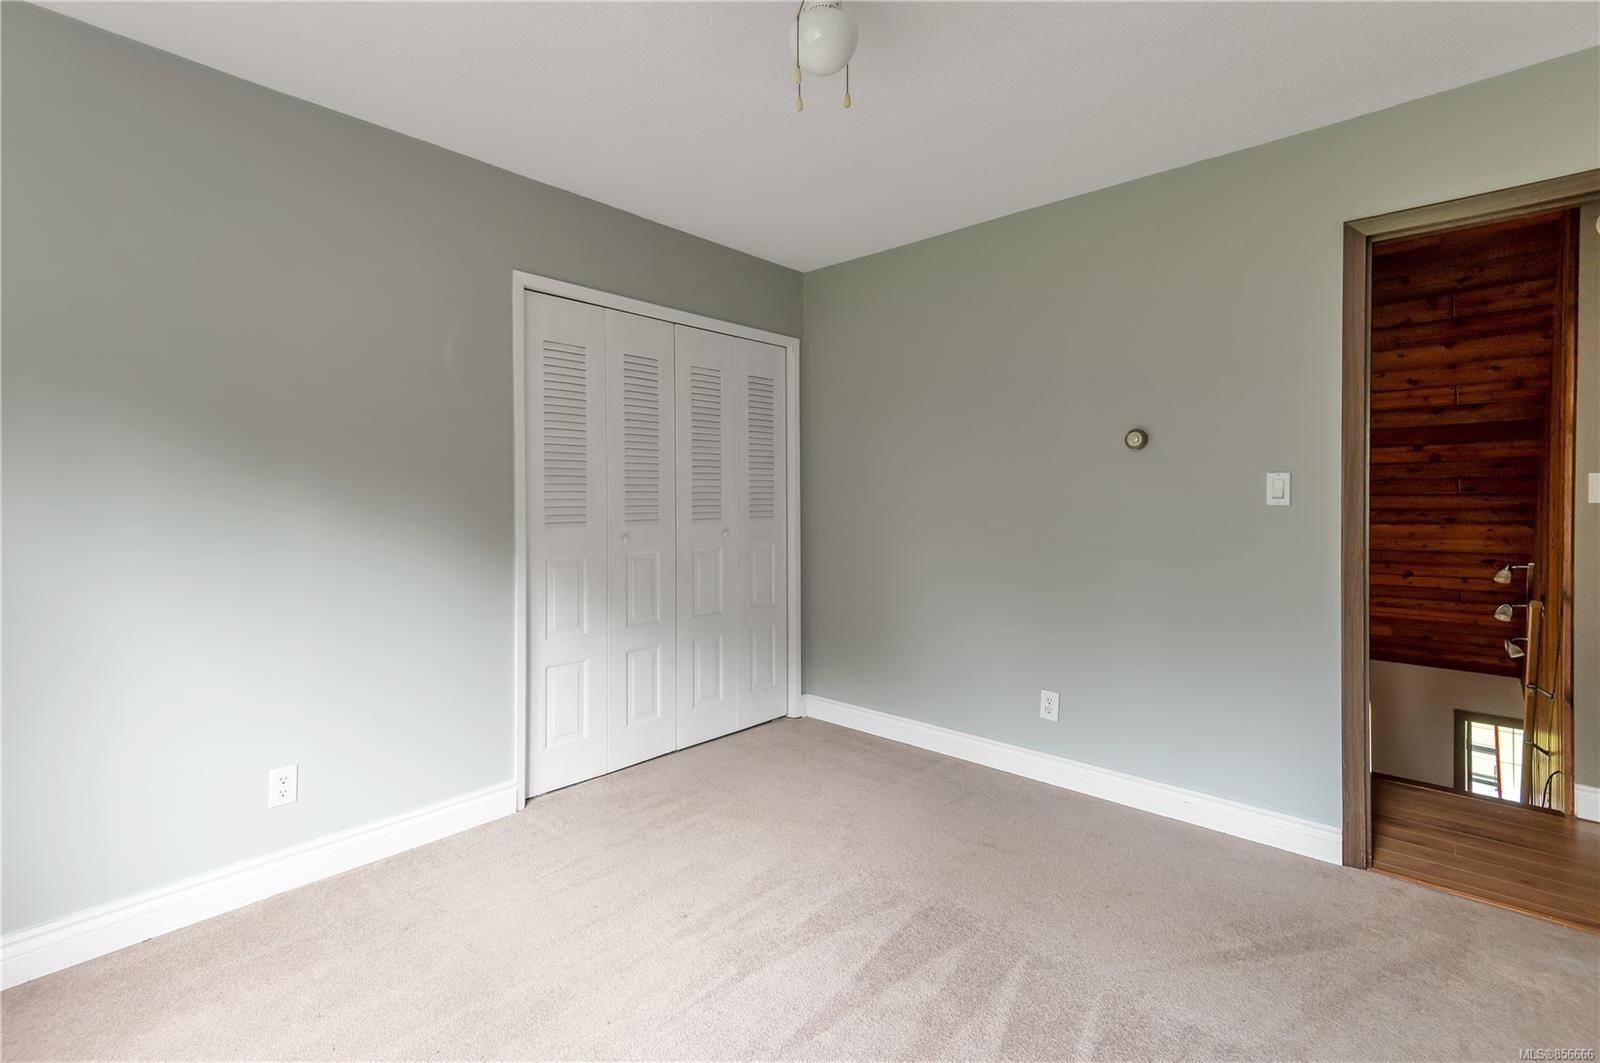 Photo 33: Photos: 2468 Oakes Rd in : CV Merville Black Creek House for sale (Comox Valley)  : MLS®# 856666